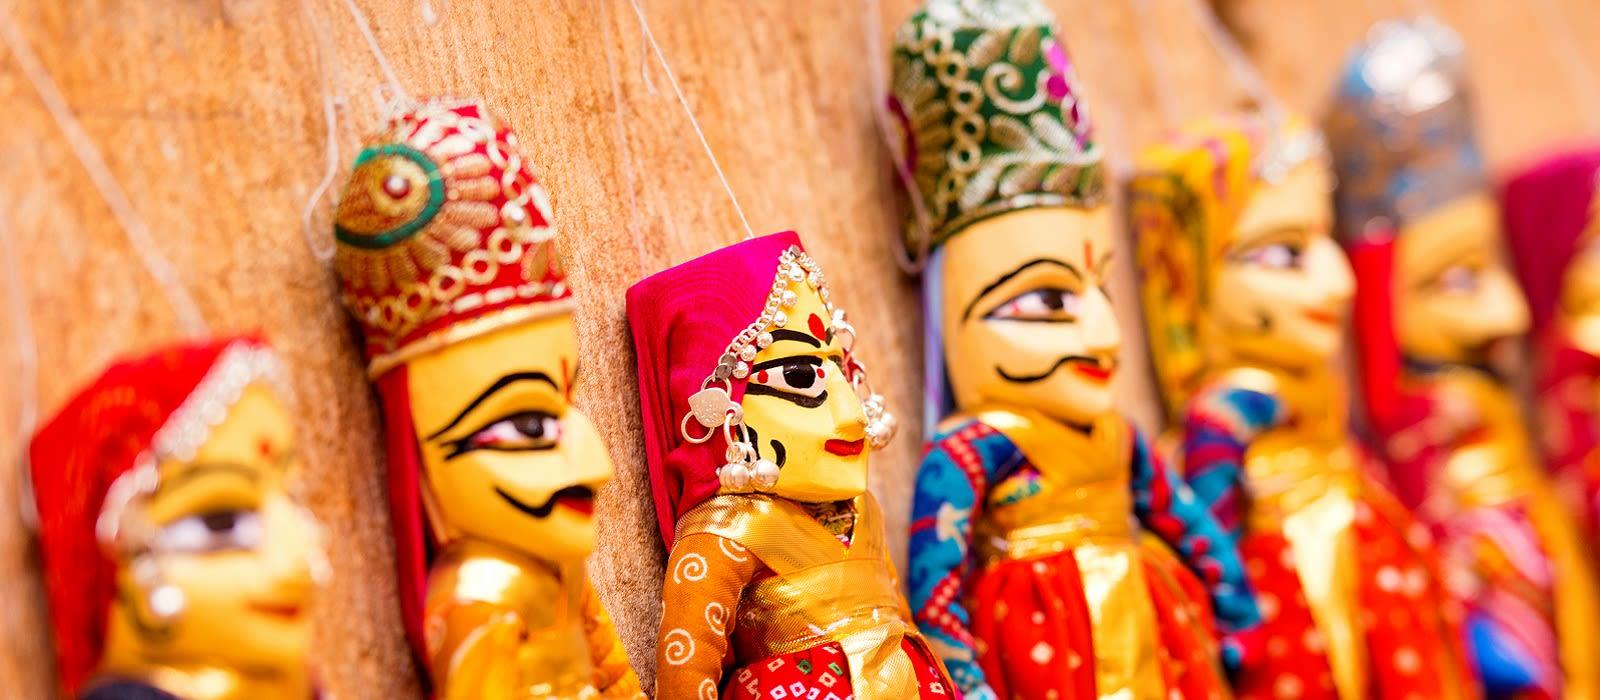 Festival Fieber: Diwali in Indien Urlaub 5